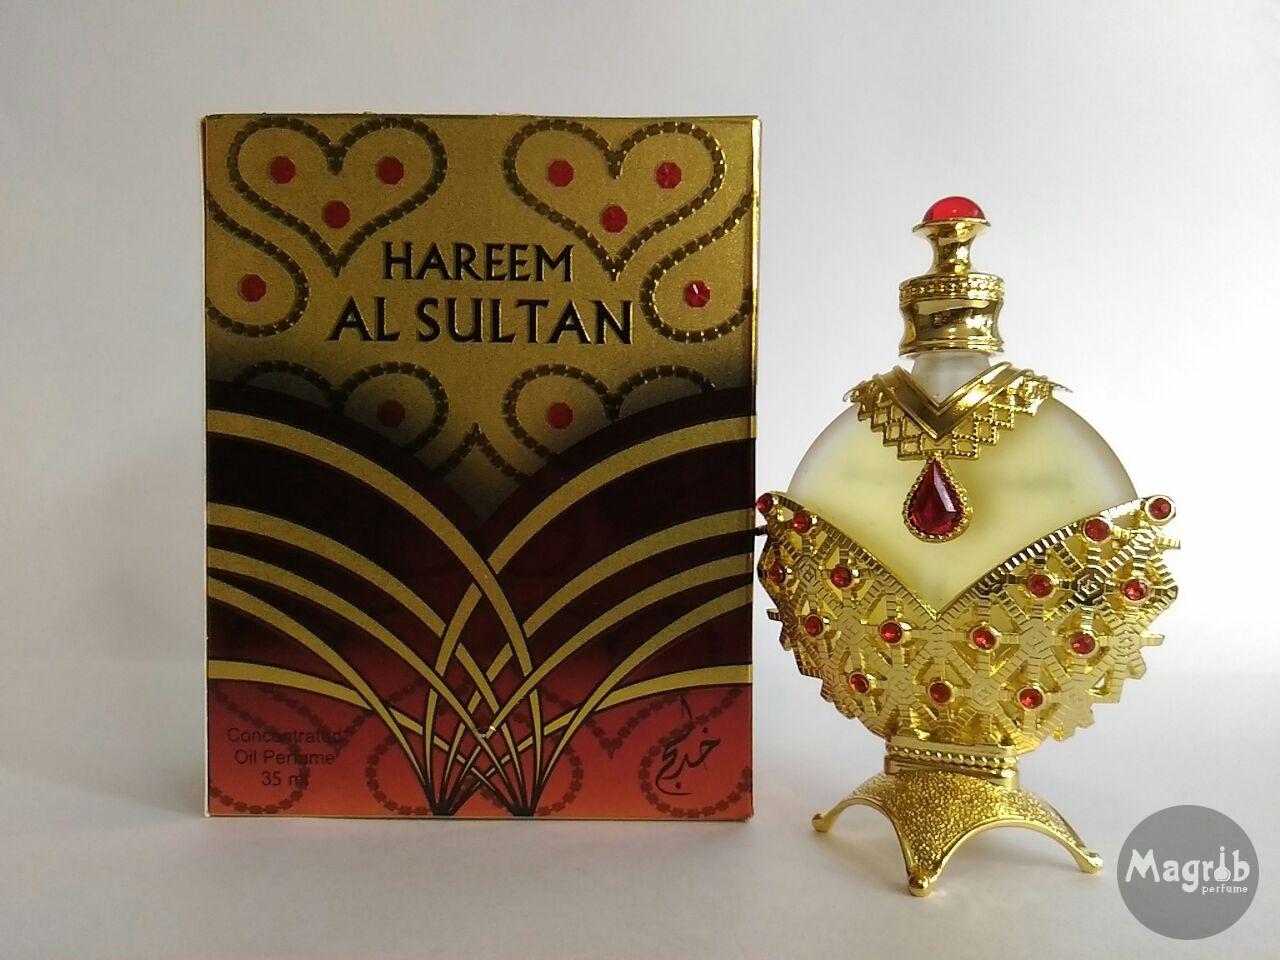 Khadlaj Hareem al Sultan gold 35ml - женские масляные духи